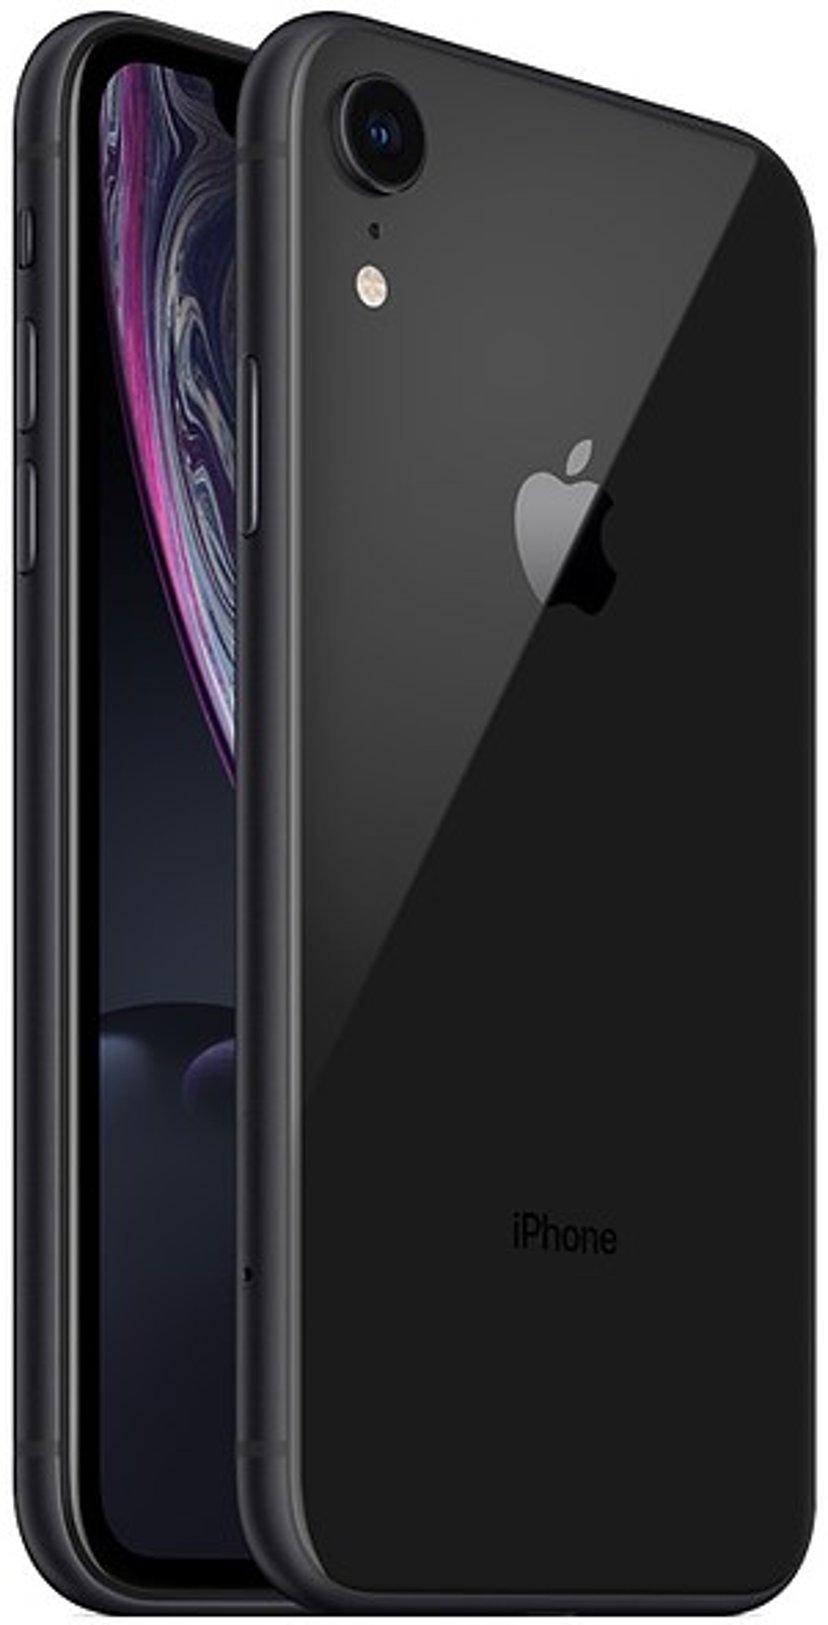 Apple iPhone XR (Ej DEP) 64GB Dual-SIM Svart   Dustin.se